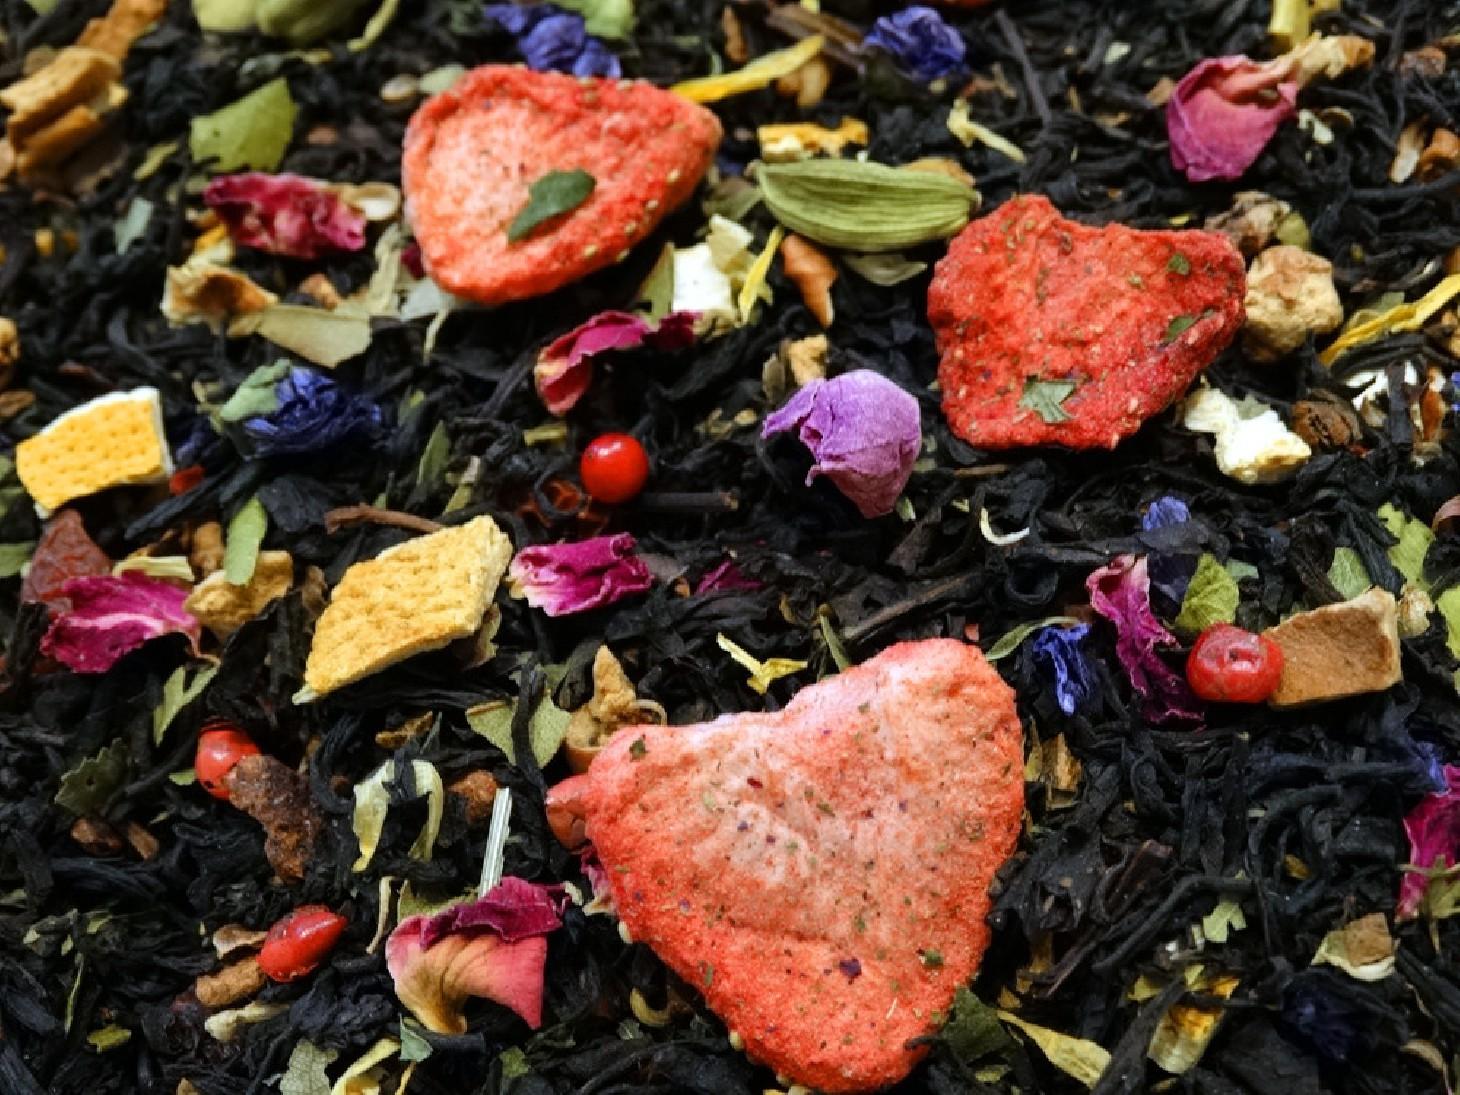 Black tea, bergamot, mint, spices, citrus fruits